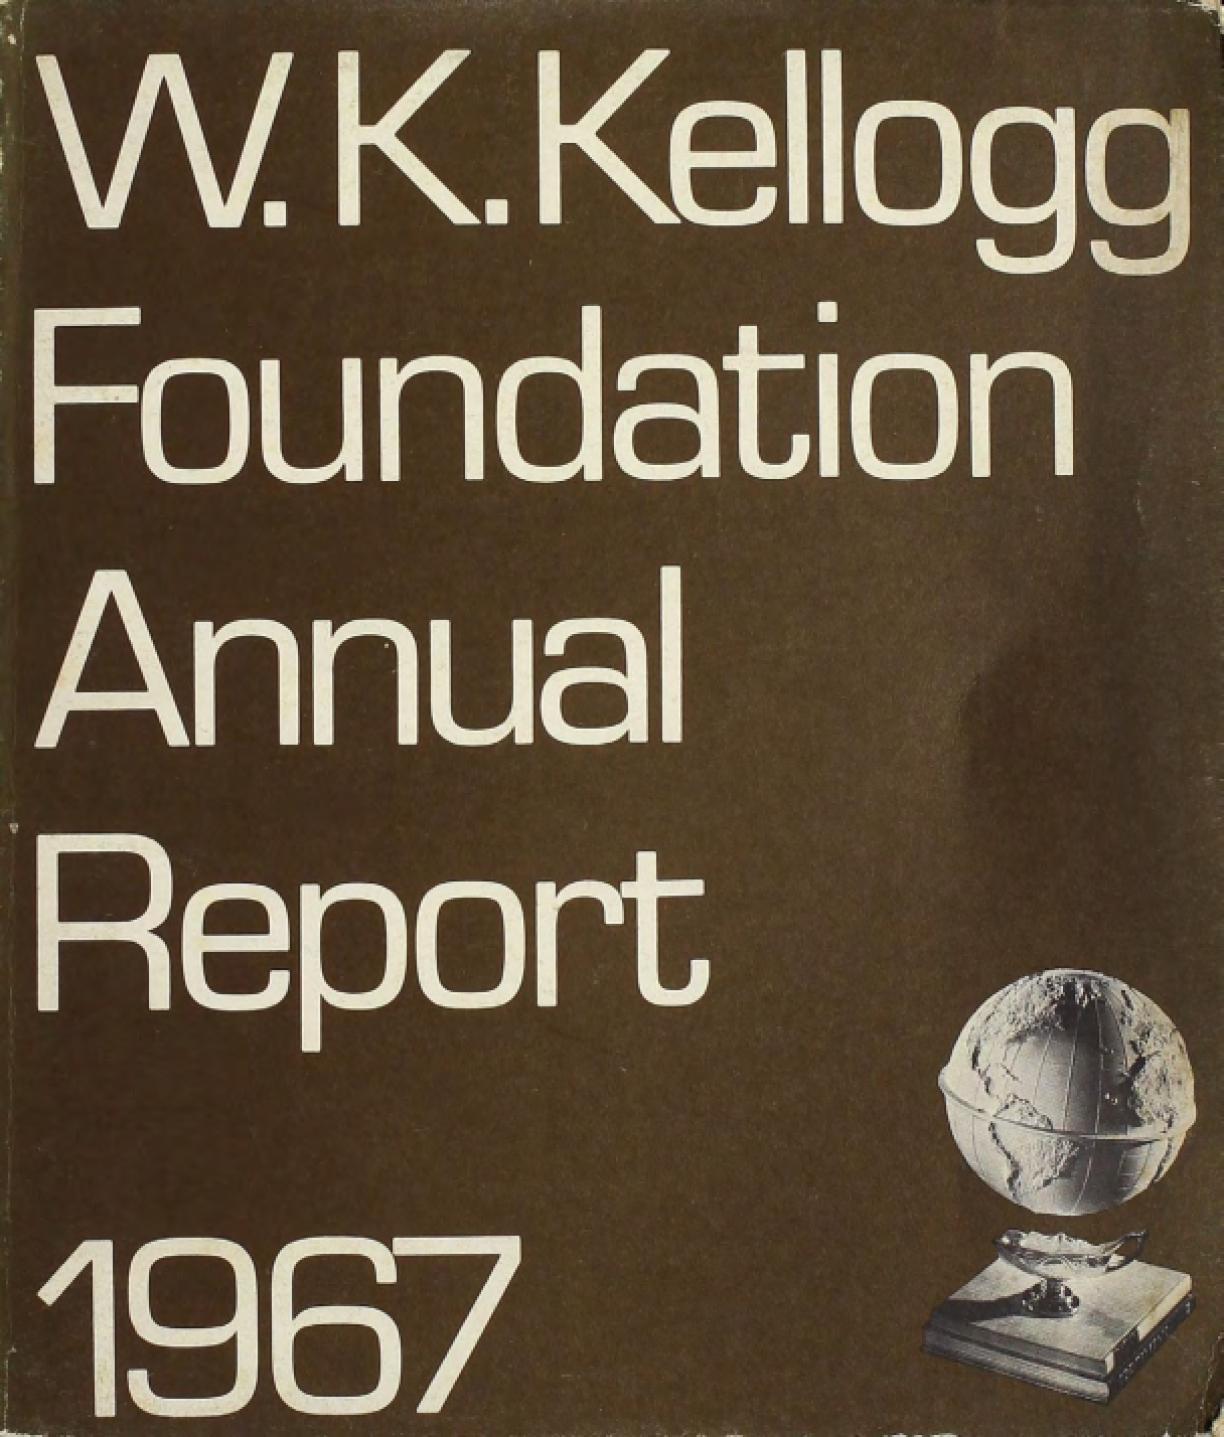 1967 W.K. Kellogg Foundation Annual Report